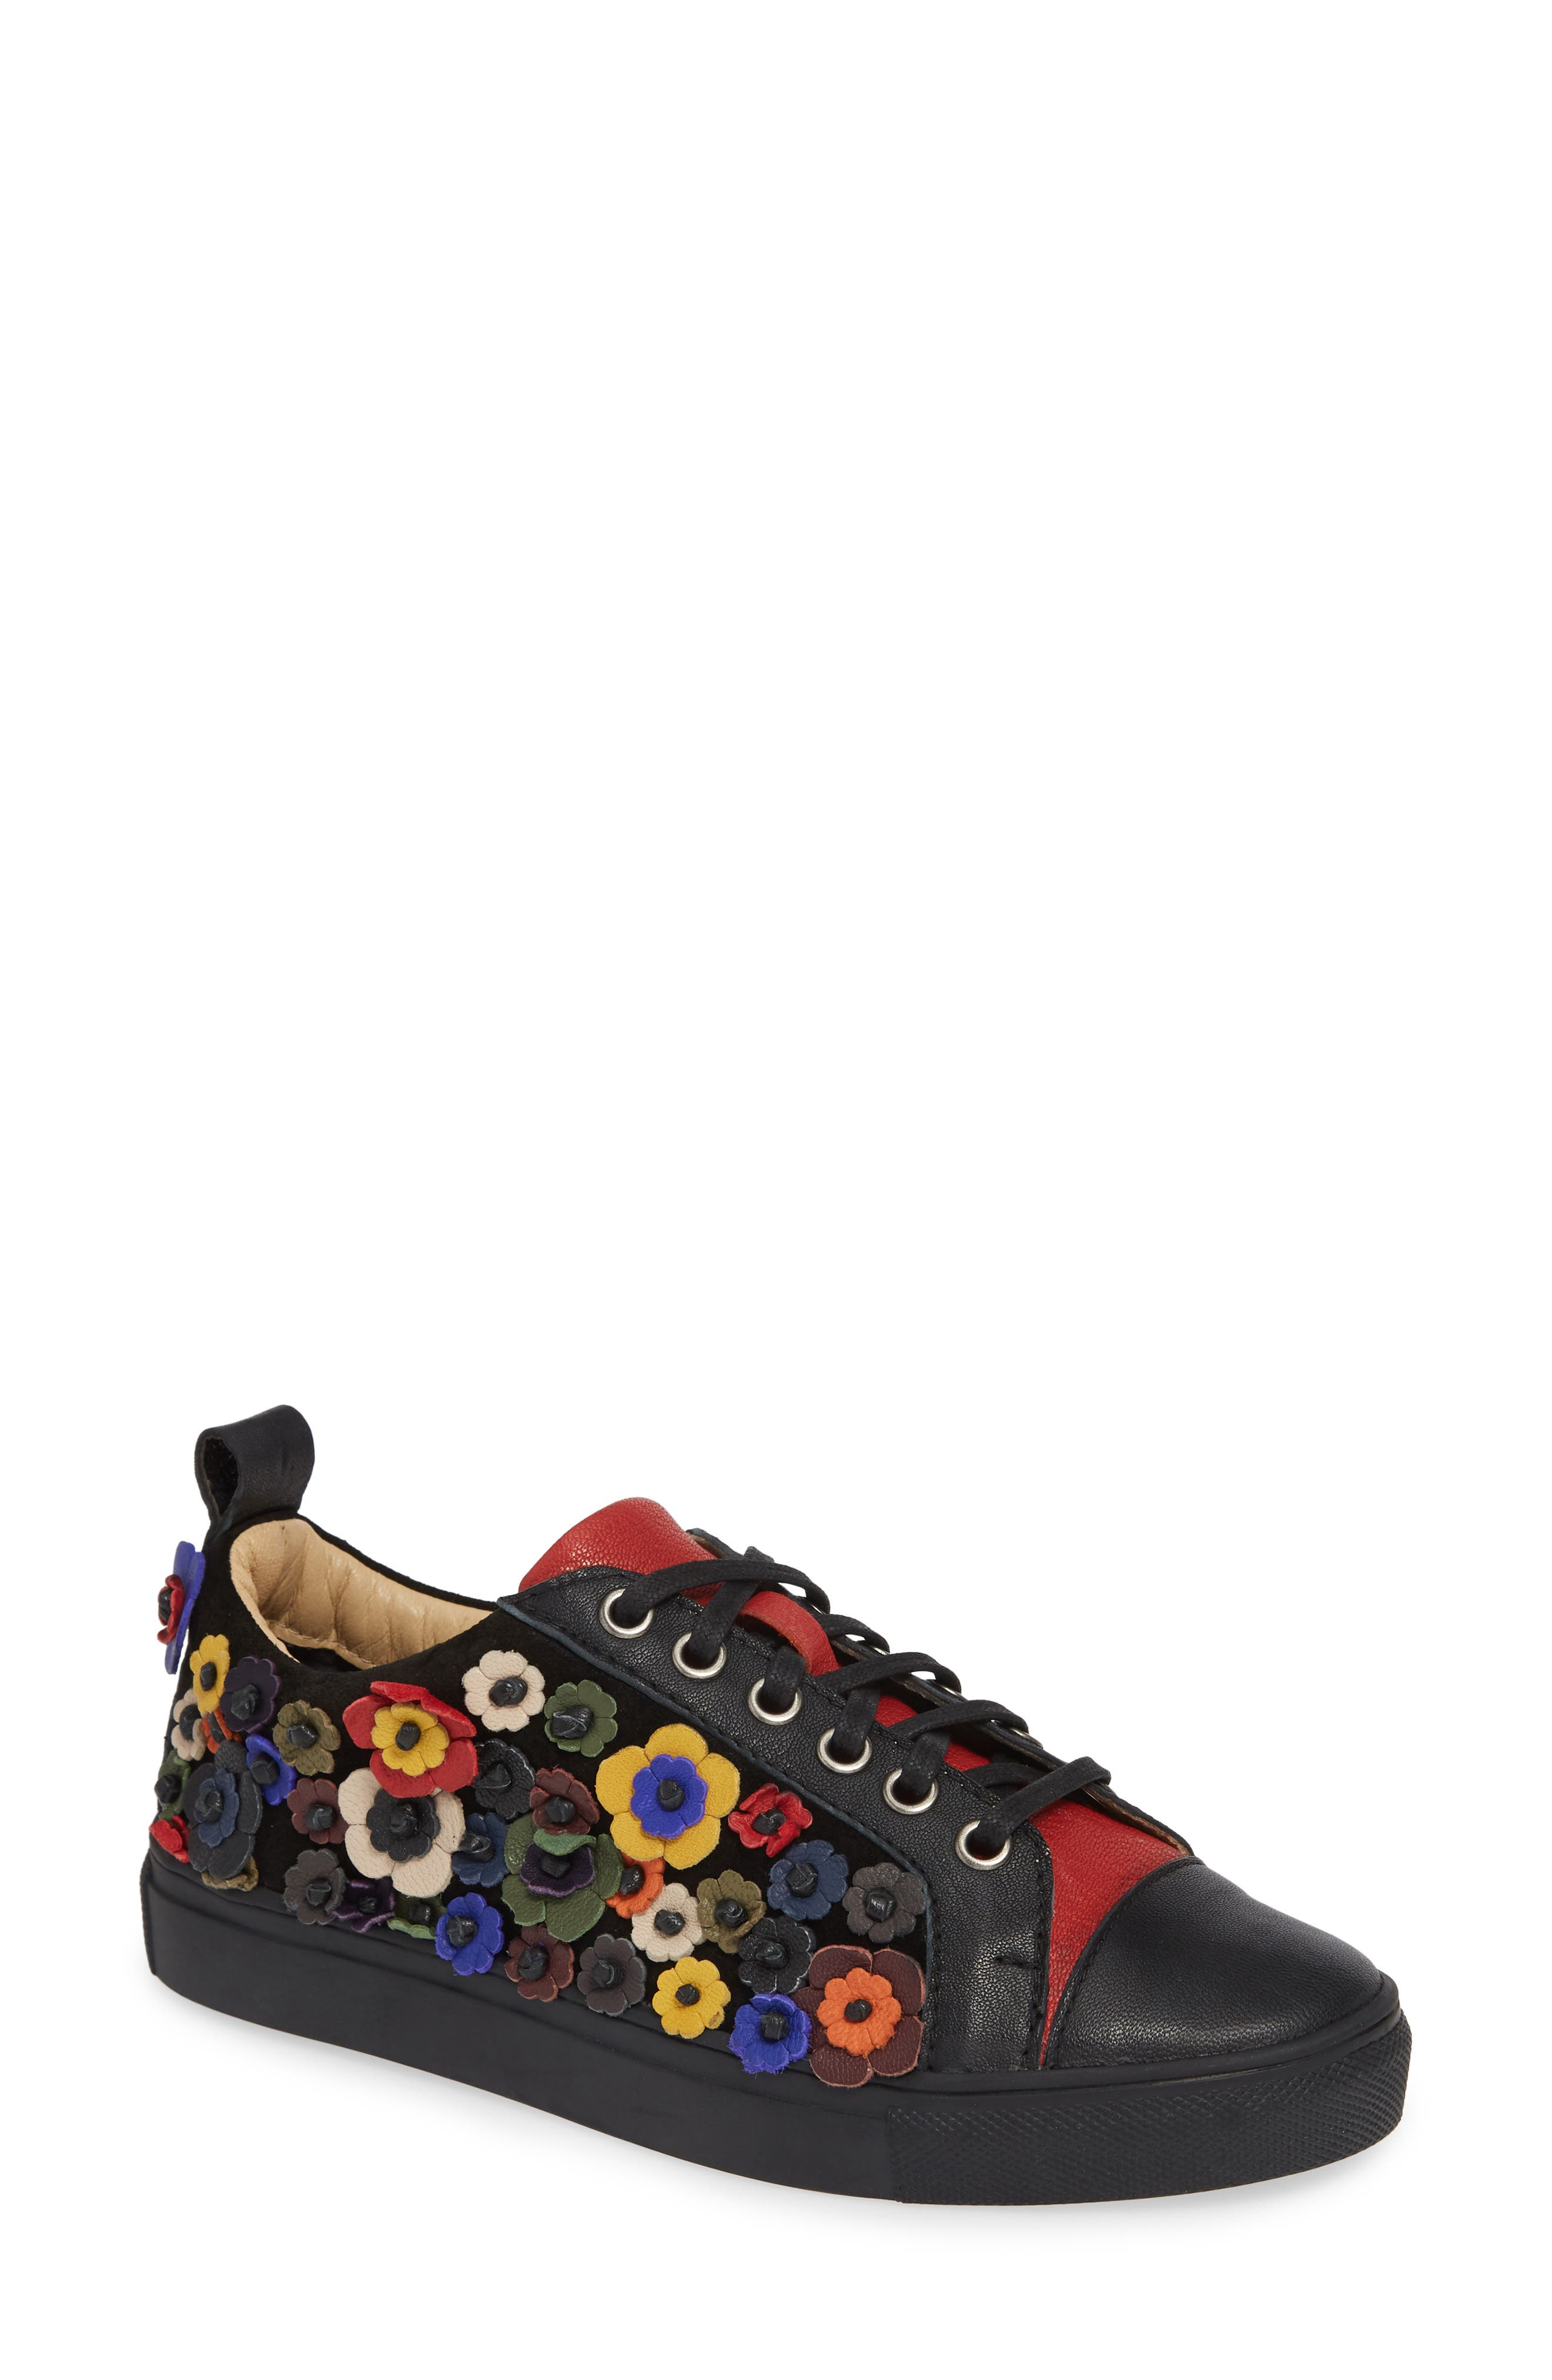 SHERIDAN MIA Satyr Sneaker, Main, color, BLACK LEATHER